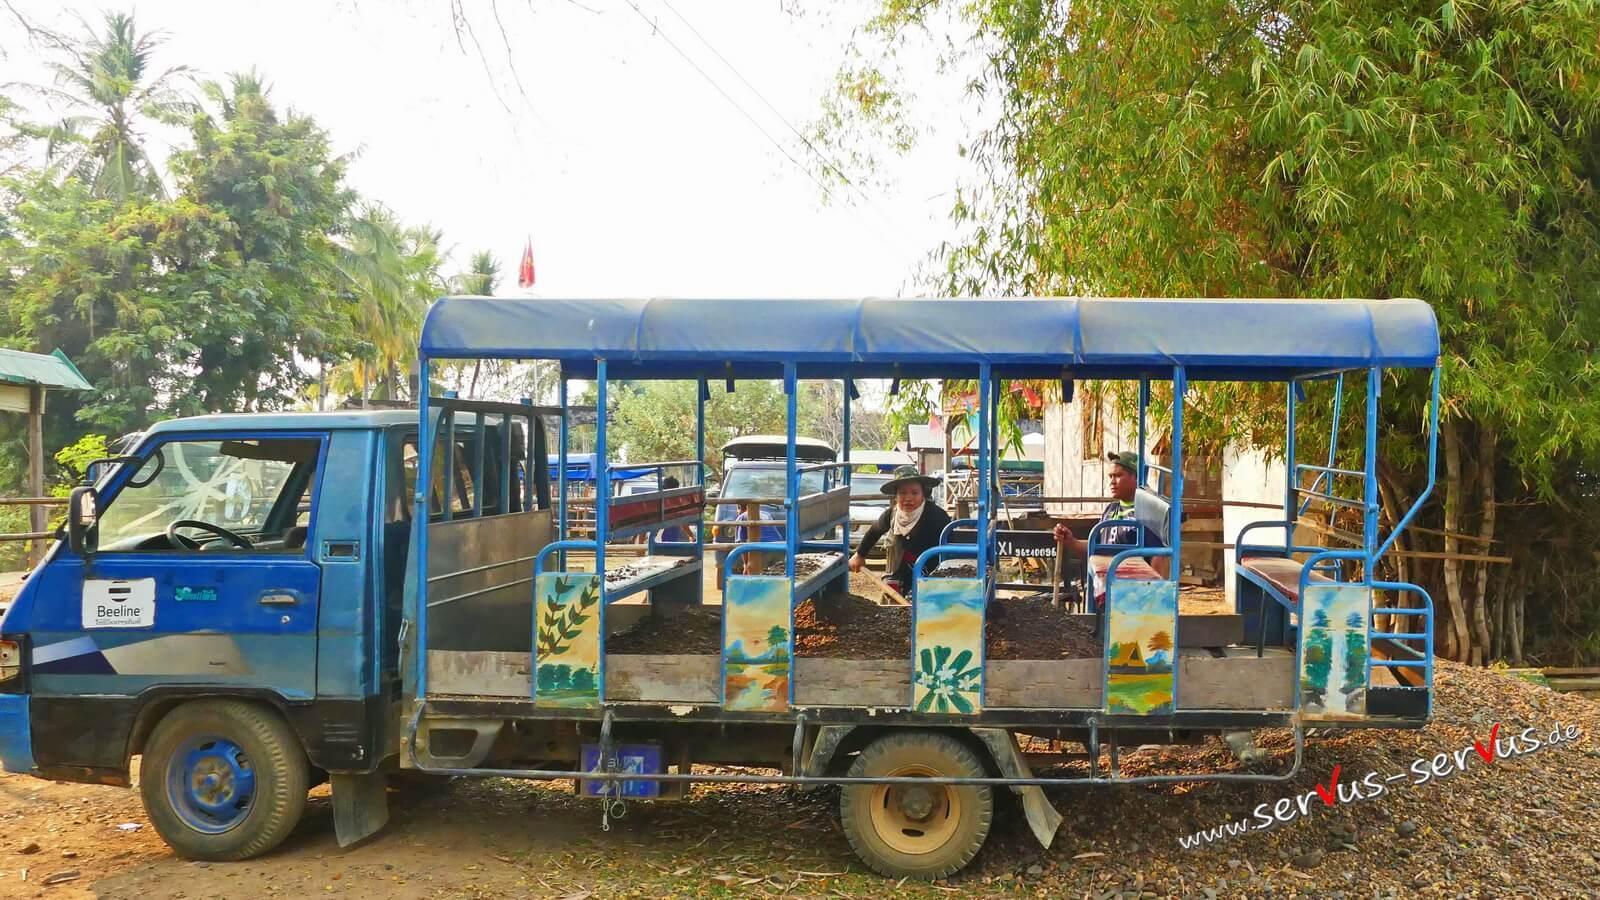 Don Det, 4000 Inseln, Laos, Minibus, Kieslaster